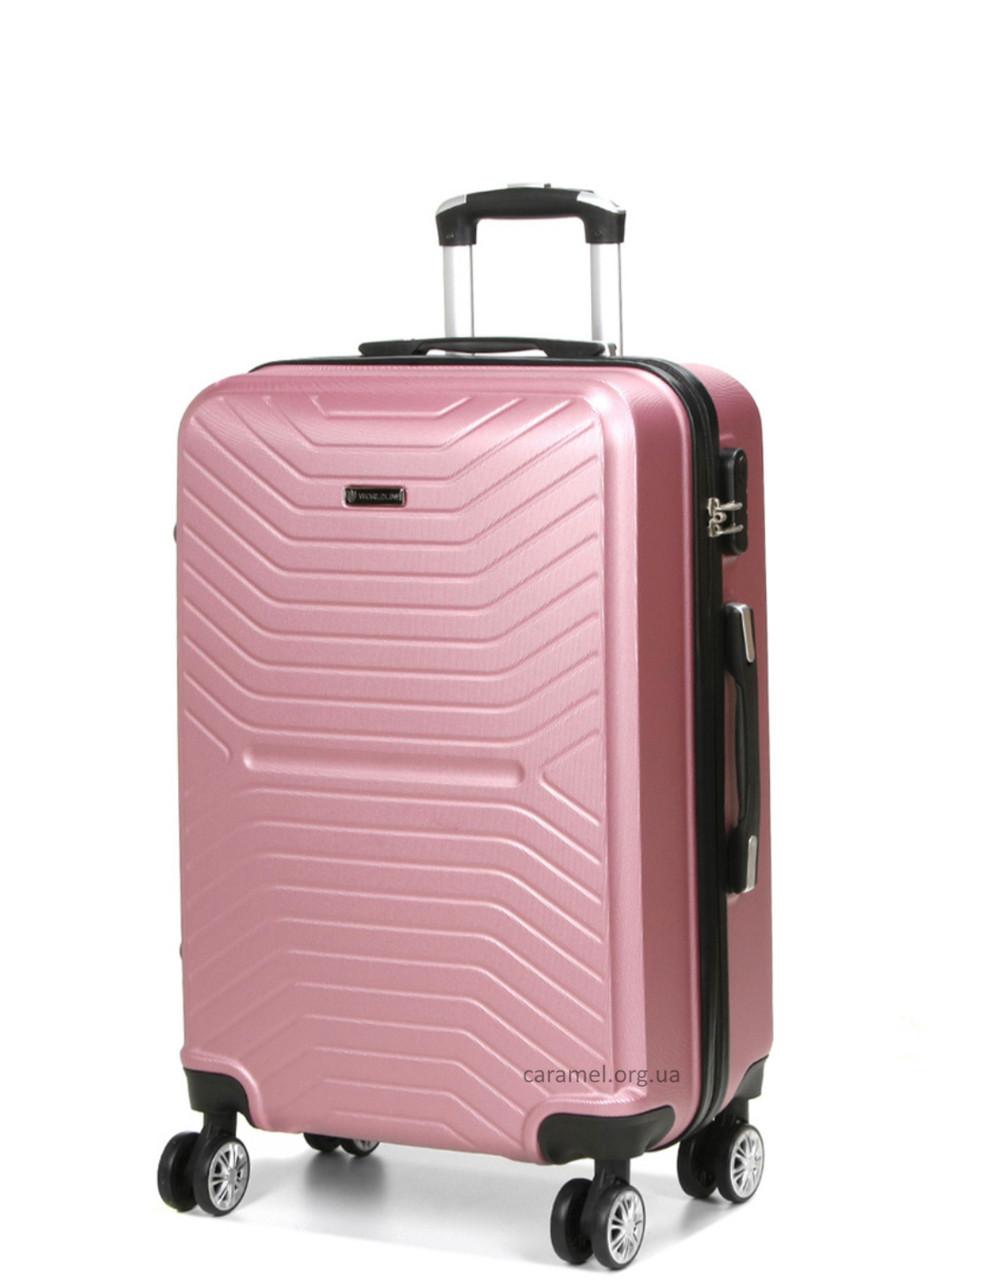 Чемодан поликарбонат  на 4х колесах средний  M розовый   66х42х26 см   3.400 кг   70 л   AIRTEX 625